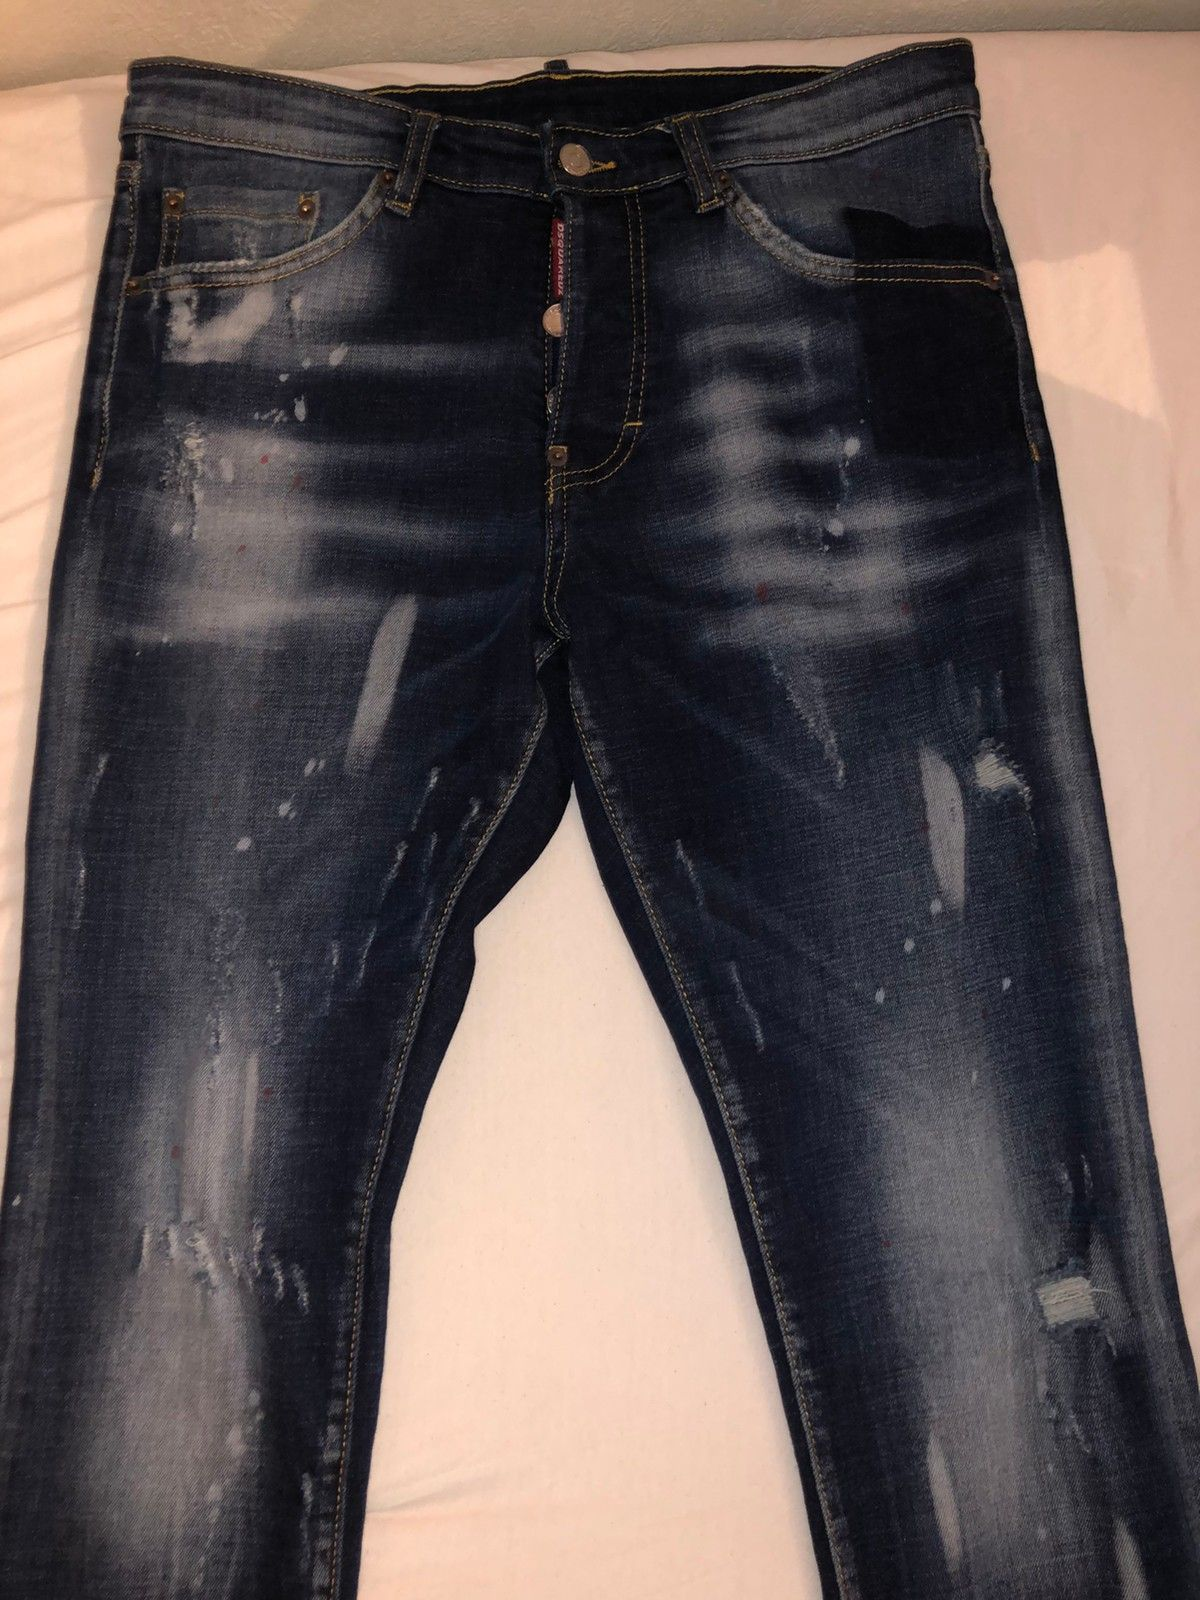 Dsquared2 jeans | FINN.no